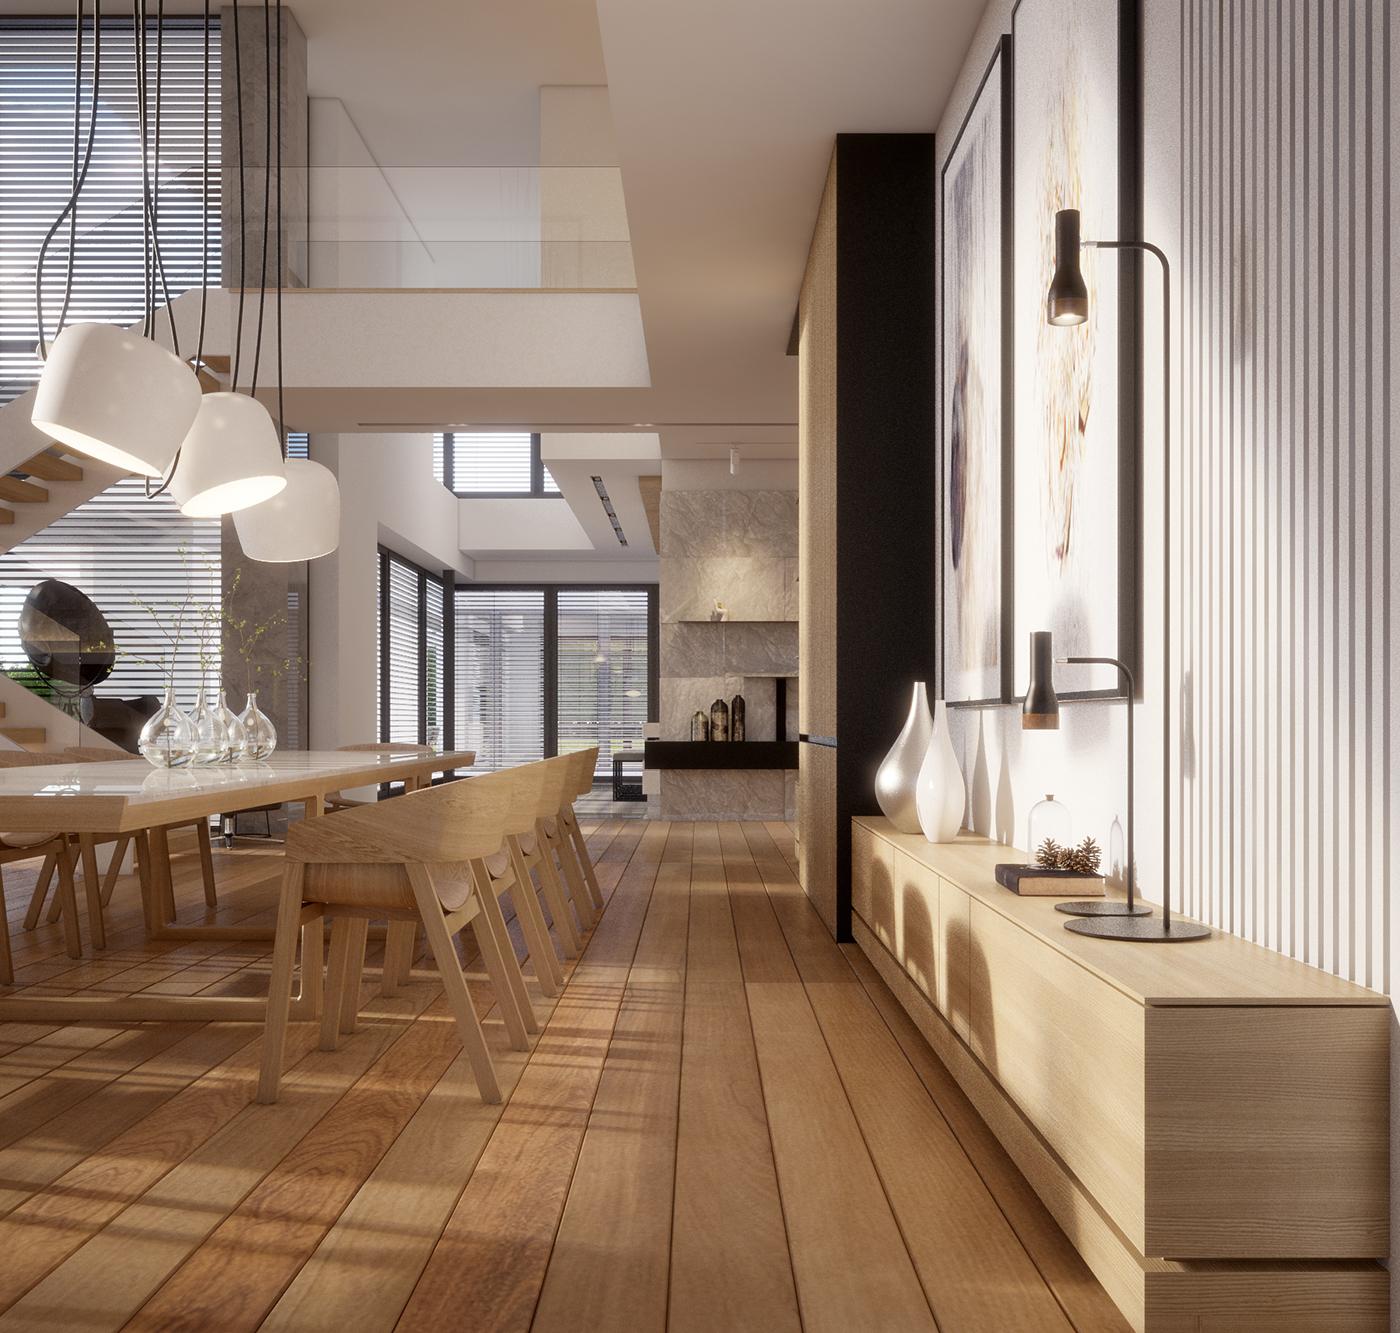 Warm Contemporary Interiors: WARM, MODERN INTERIOR DESIGN (vis. For Lk-projekt.pl) On